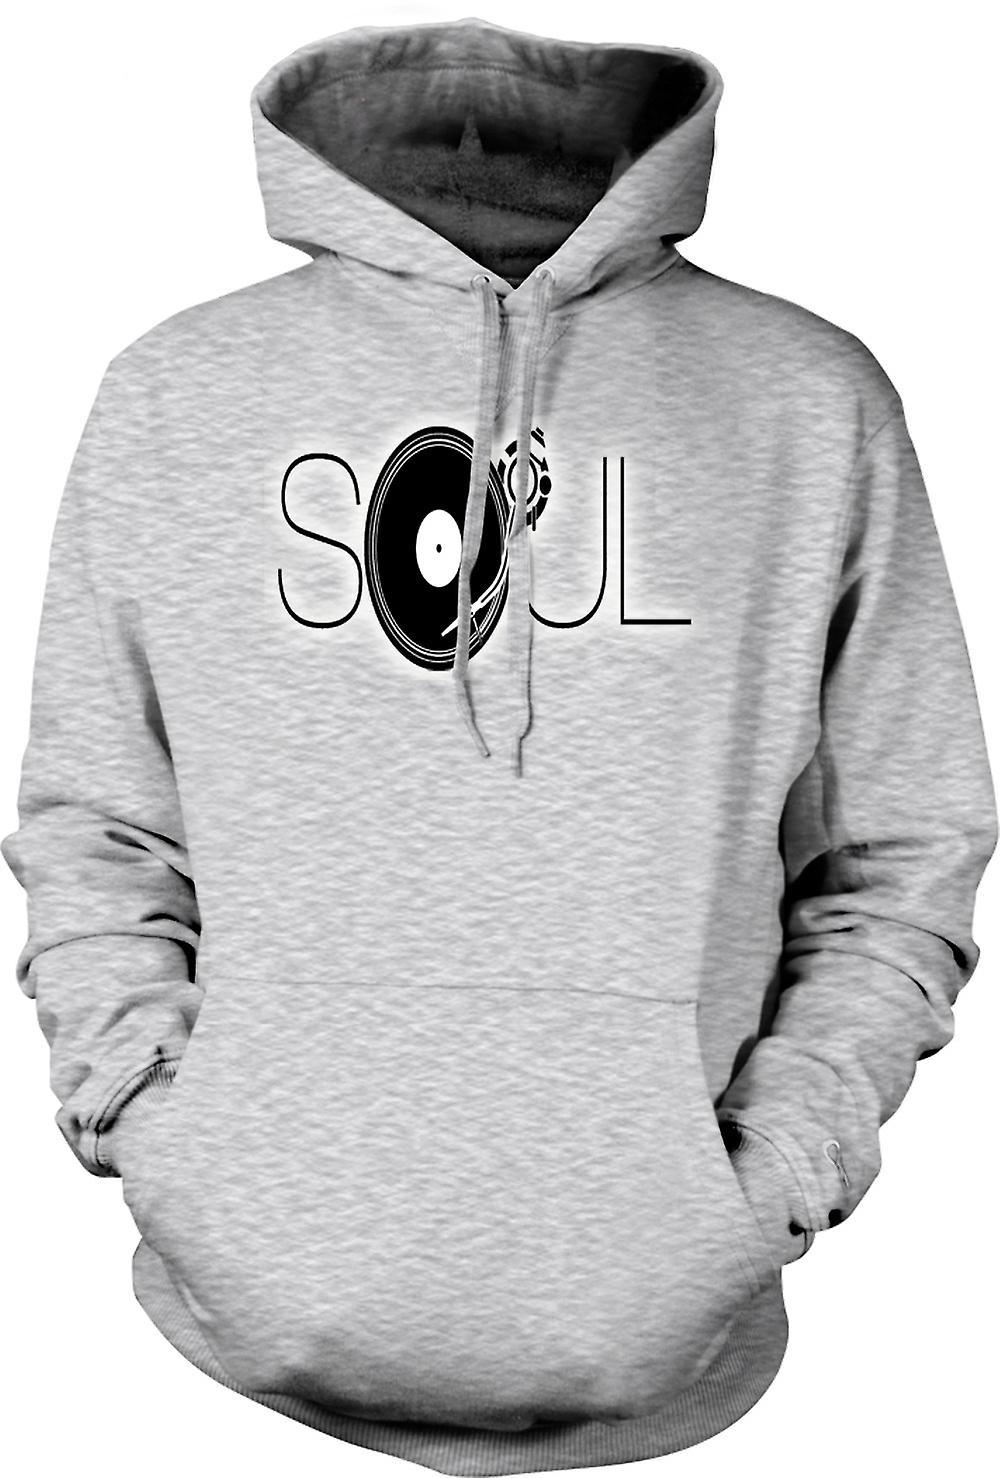 Mens Hoodie - Soul - Retro musik DJ